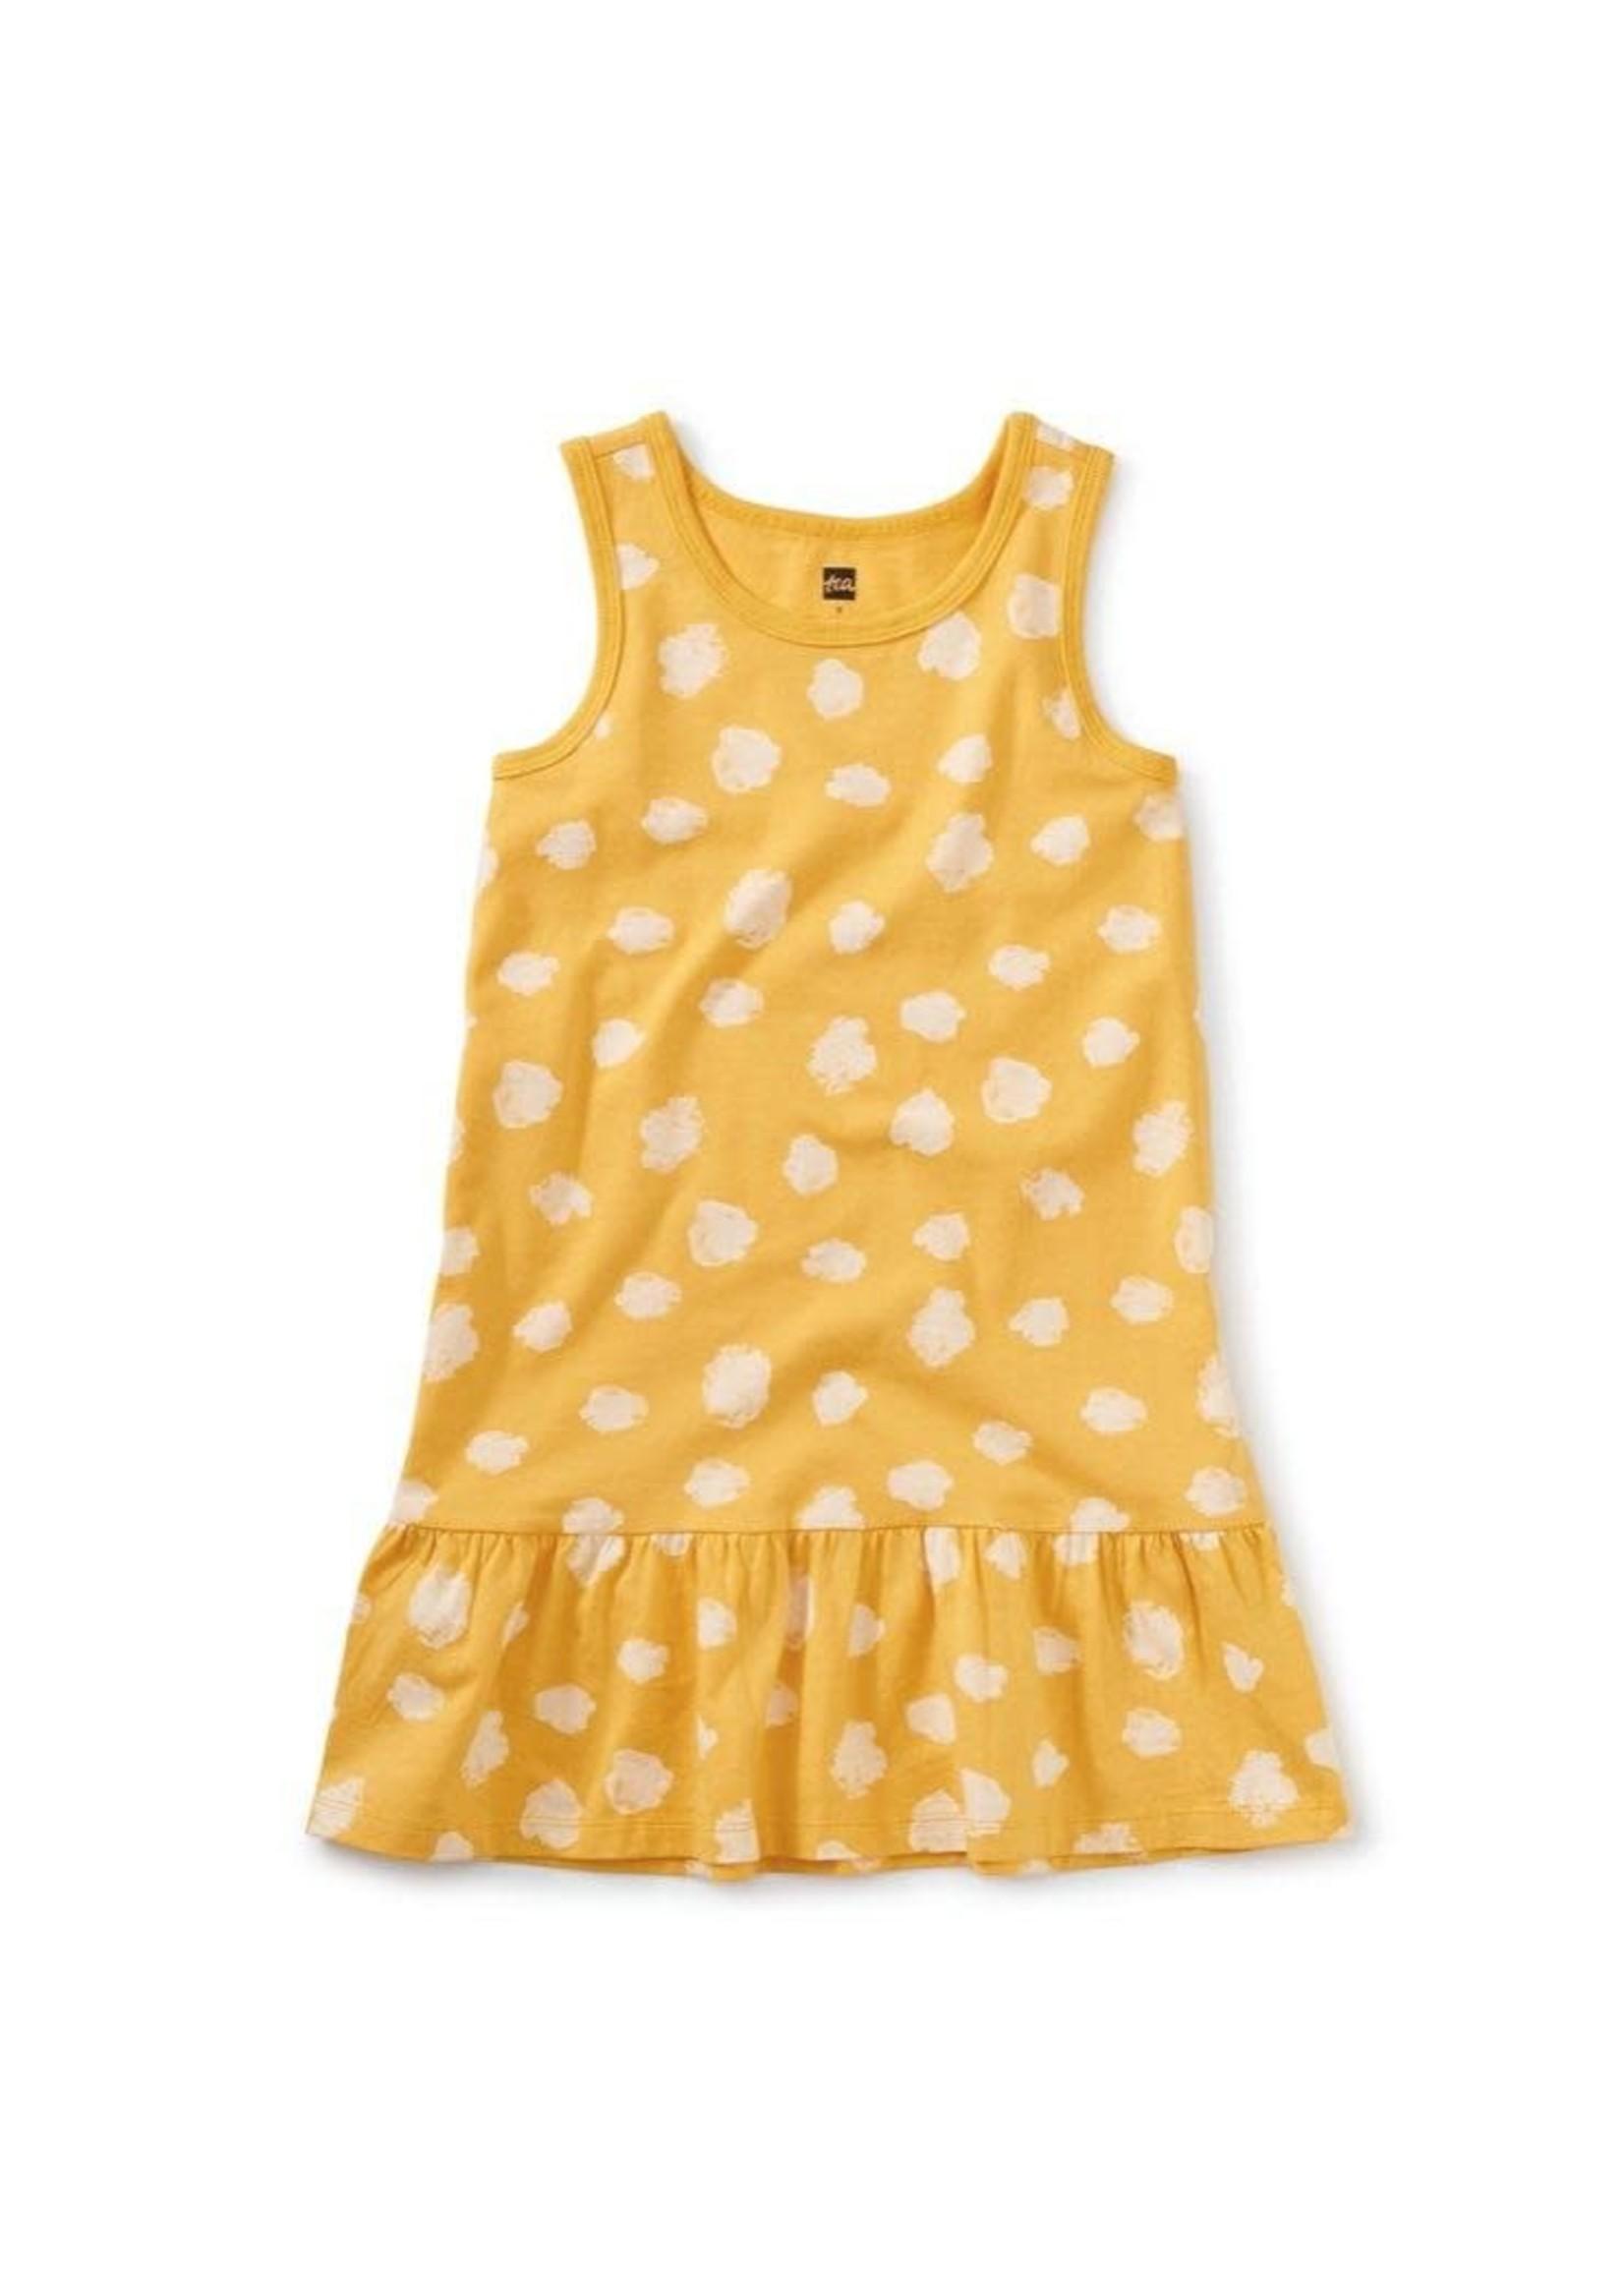 Tea Collection Polka Dot Print Tank Dress